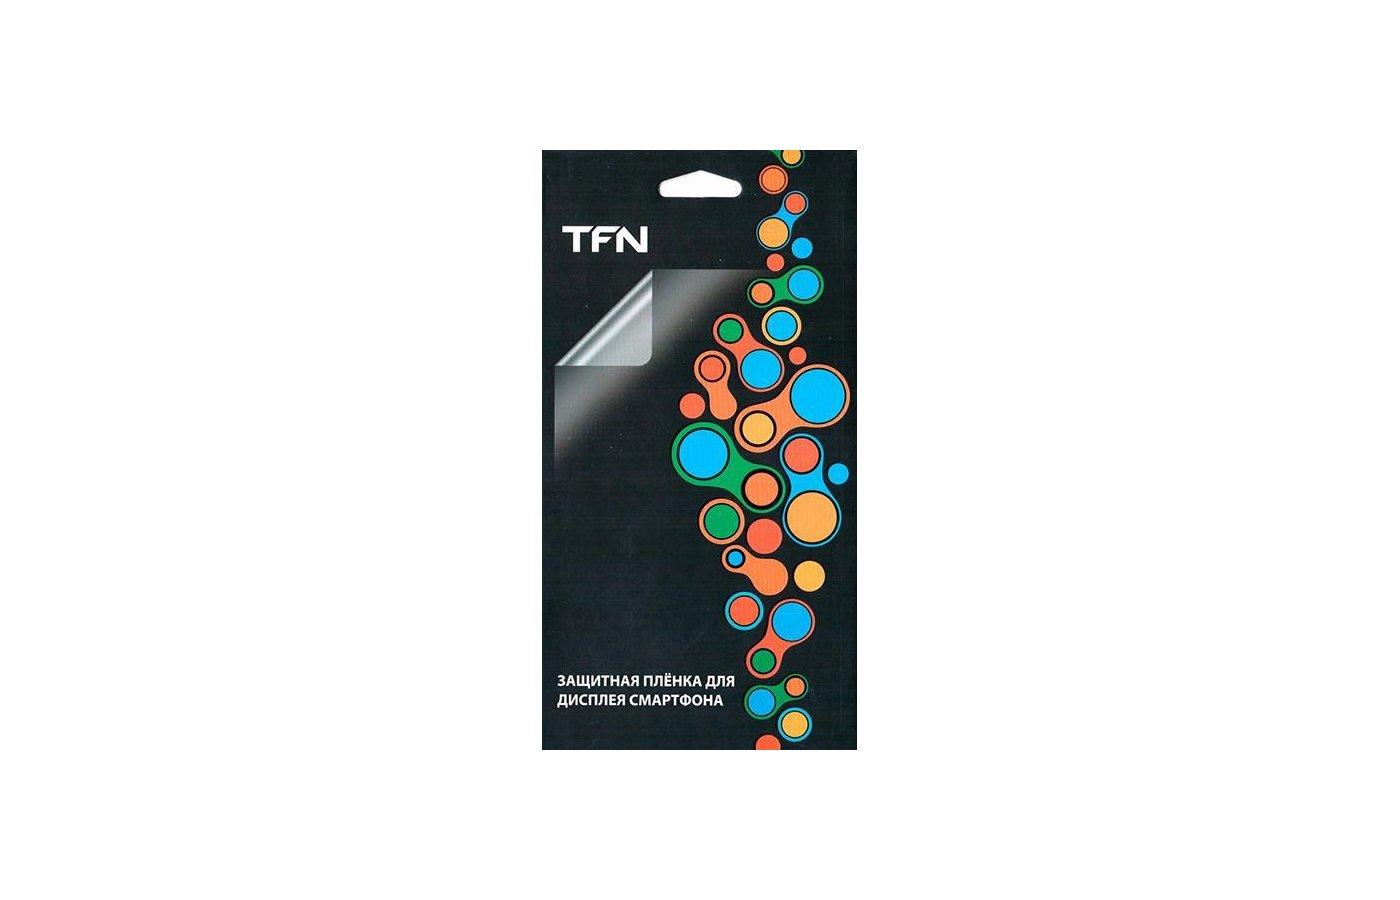 Стекло TFN пленка для Samsung J3 LTE 2016 глянцевая